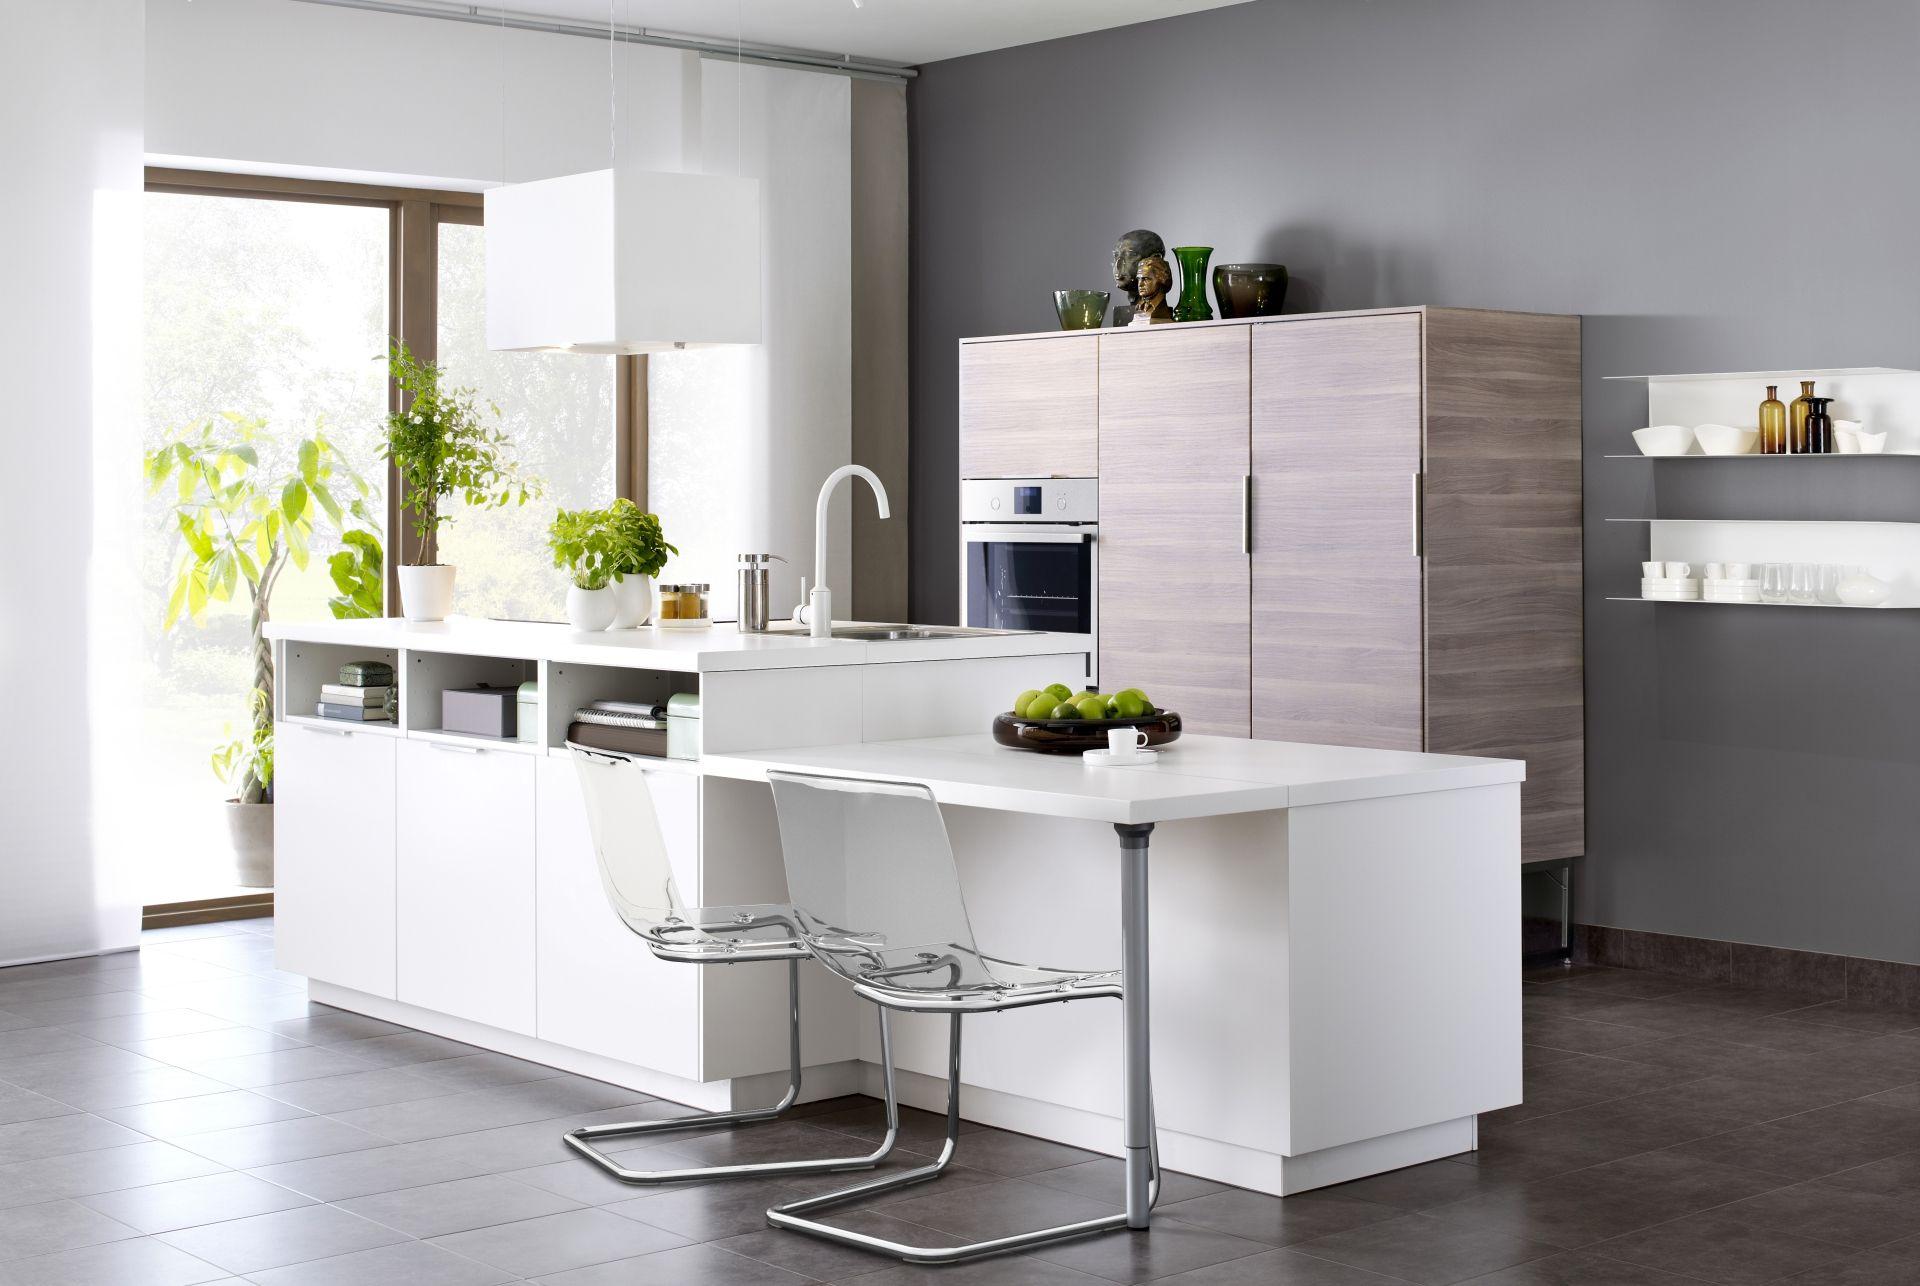 ikea k che online kaufen ikea k chen online bestellen. Black Bedroom Furniture Sets. Home Design Ideas